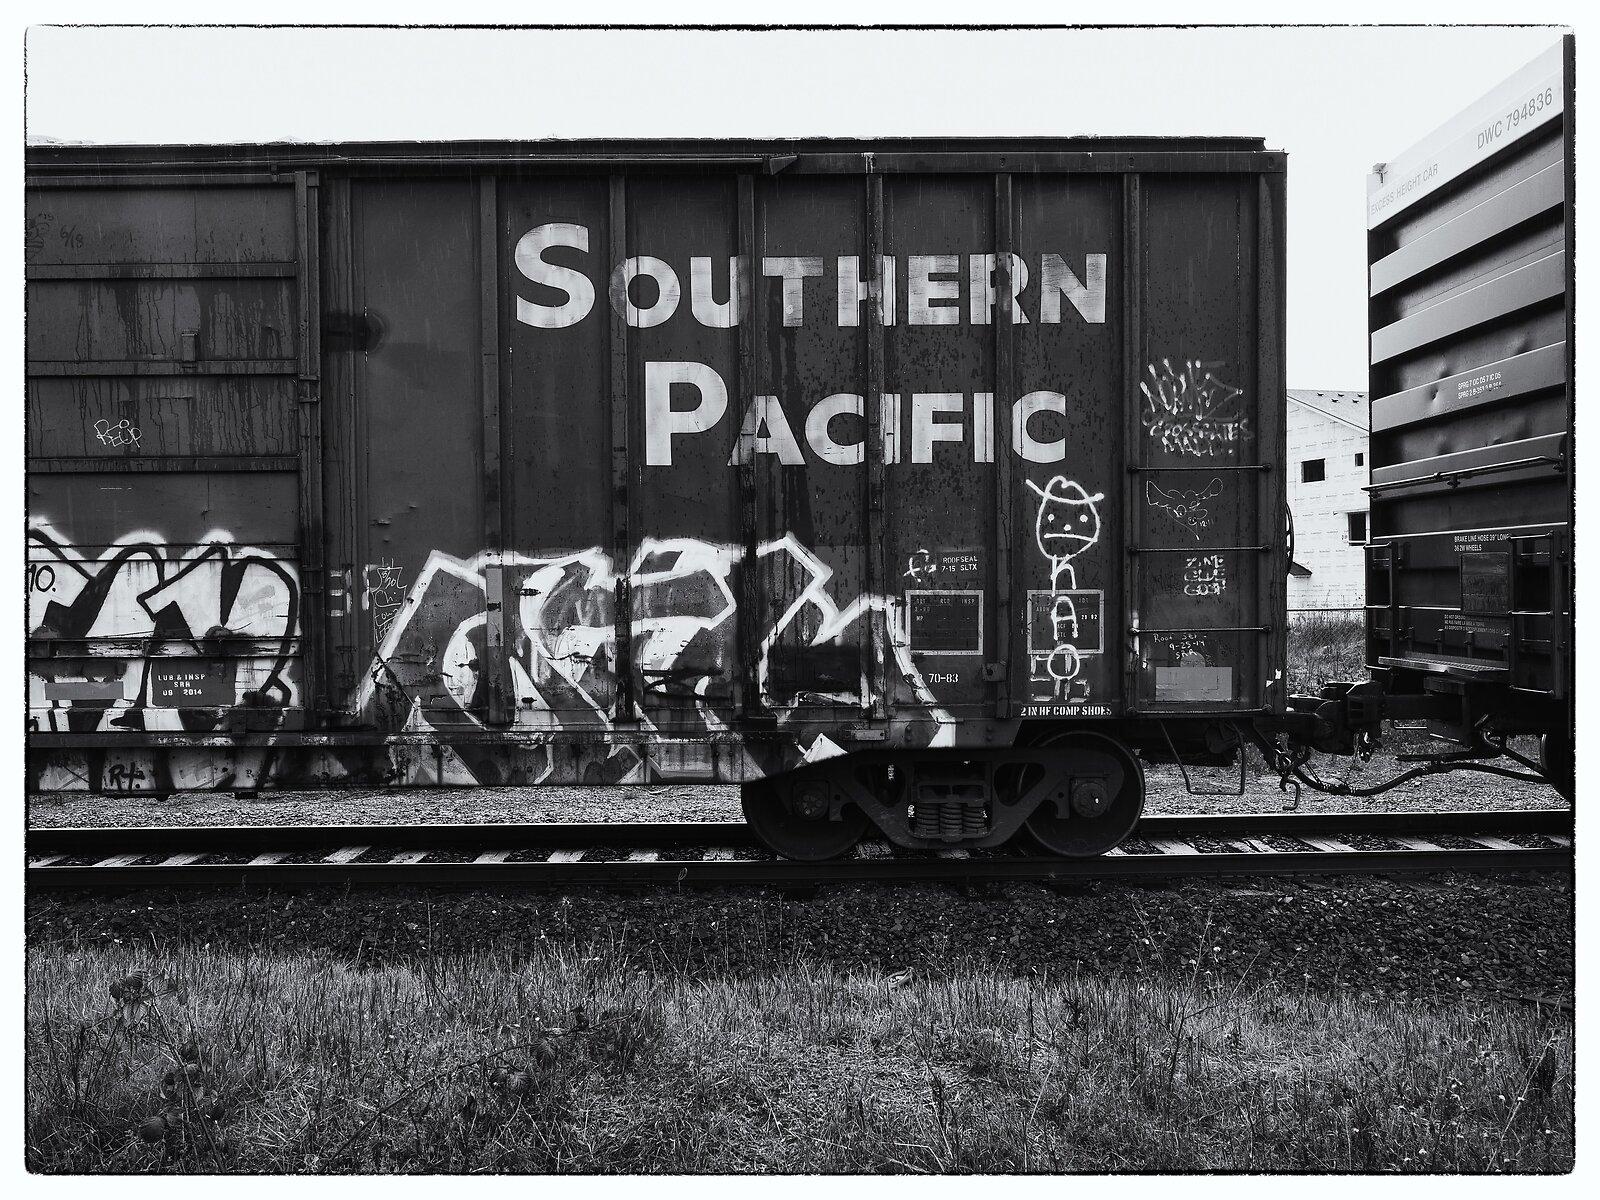 GX9_Jan28_21_Southern_Pacific.jpg